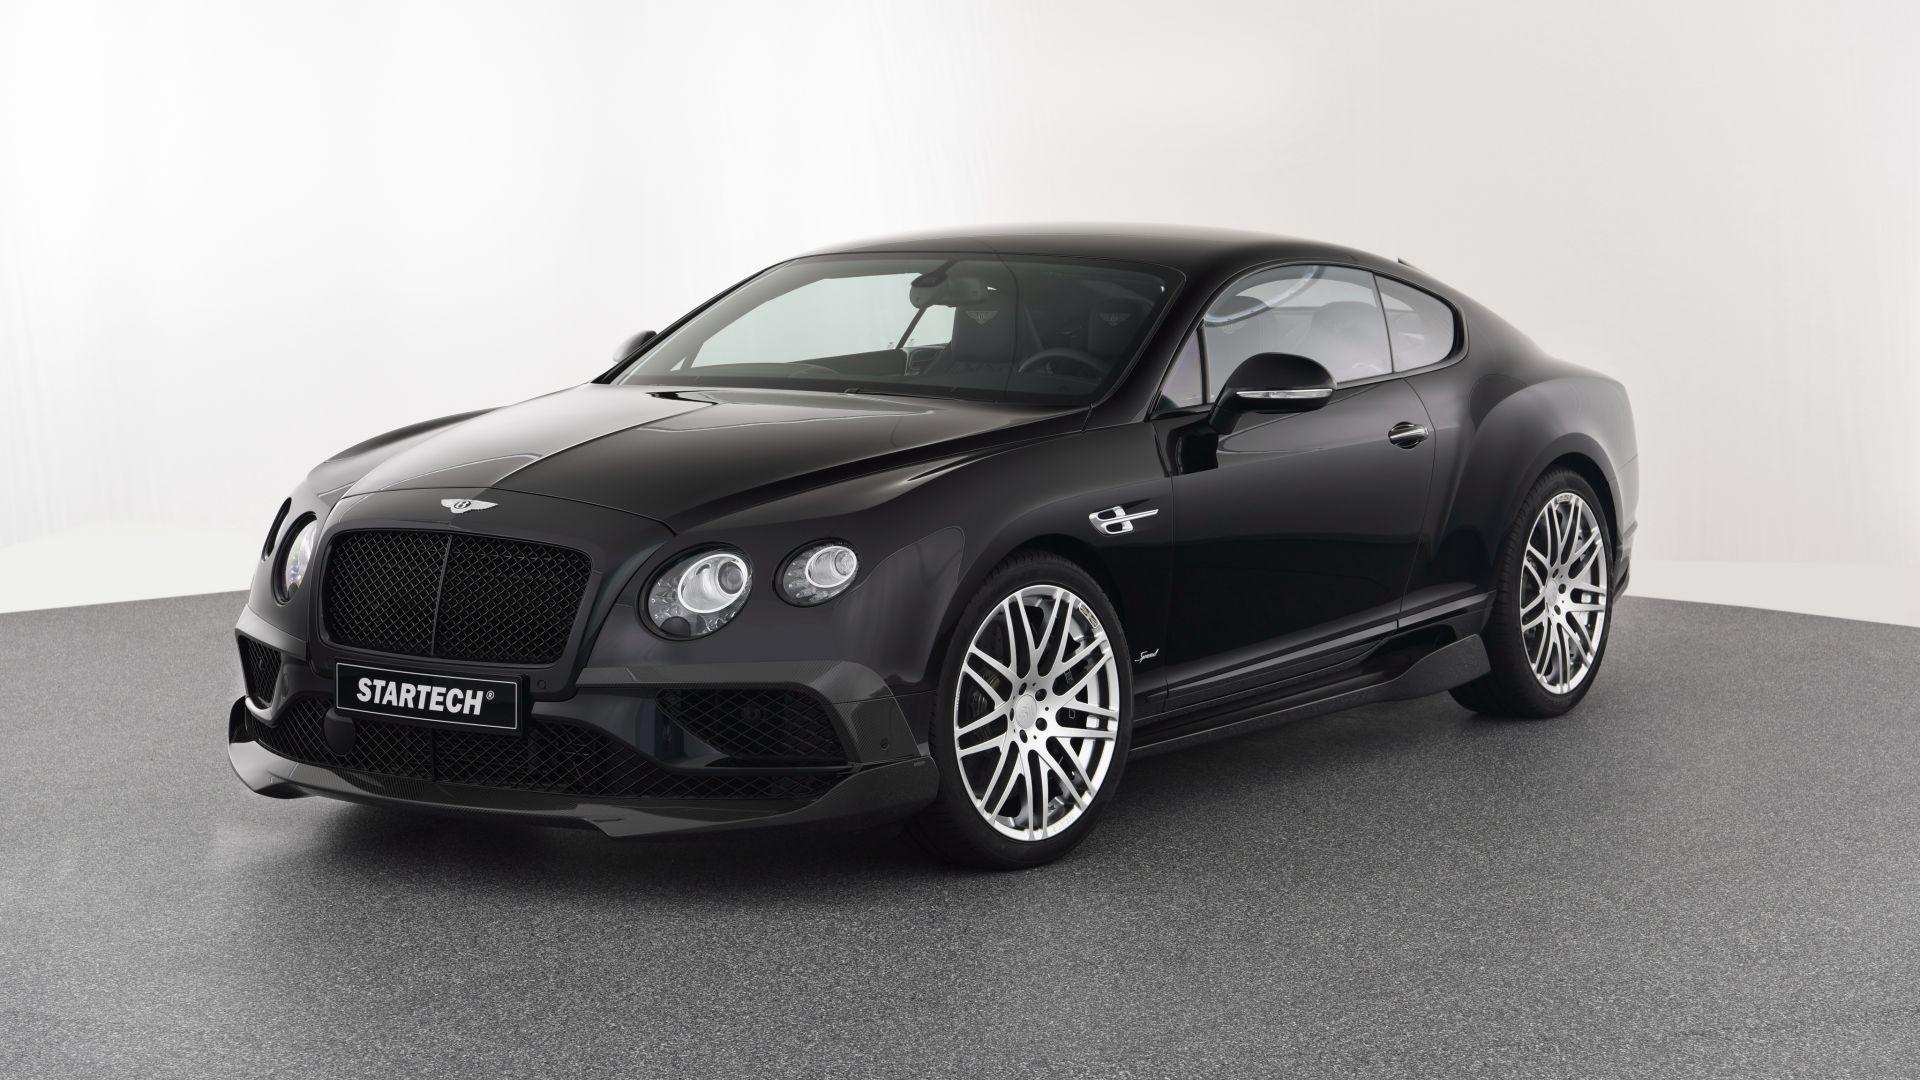 Wallpaper Black Bentley Continental GT, luxury car